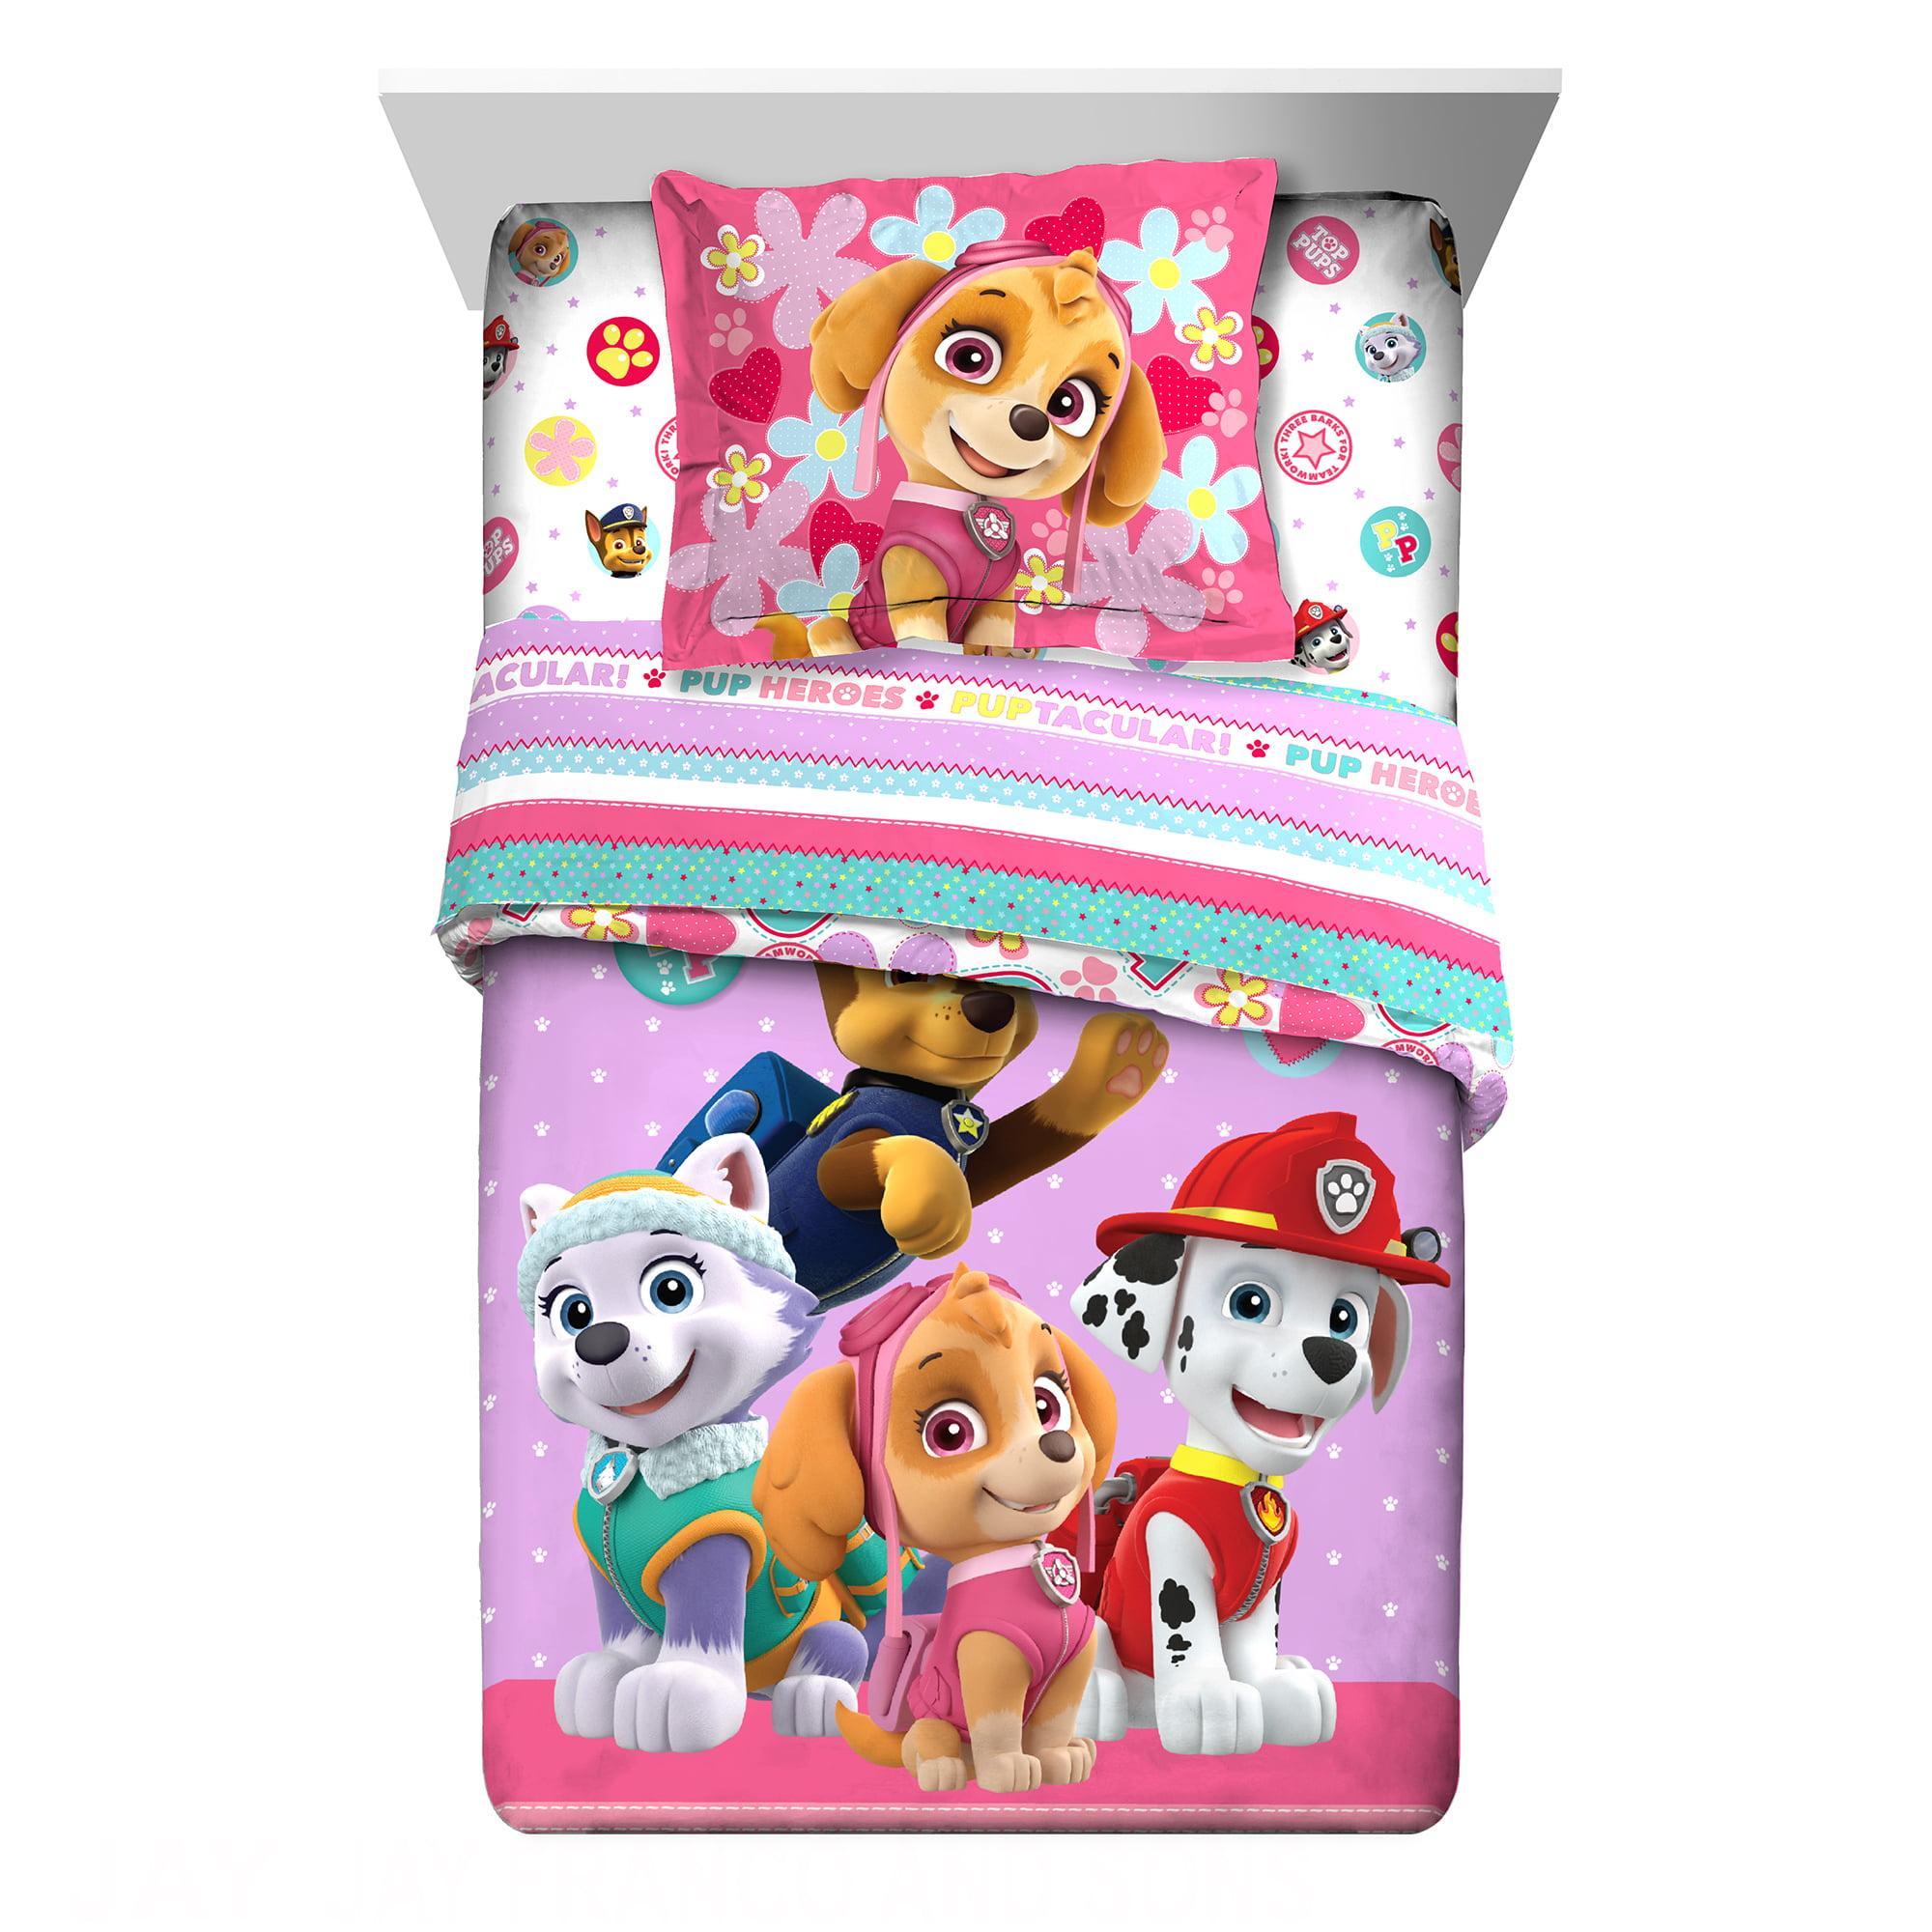 PAW Patrol 2-Piece Comforter and Sham Set, Kids Bedding ...